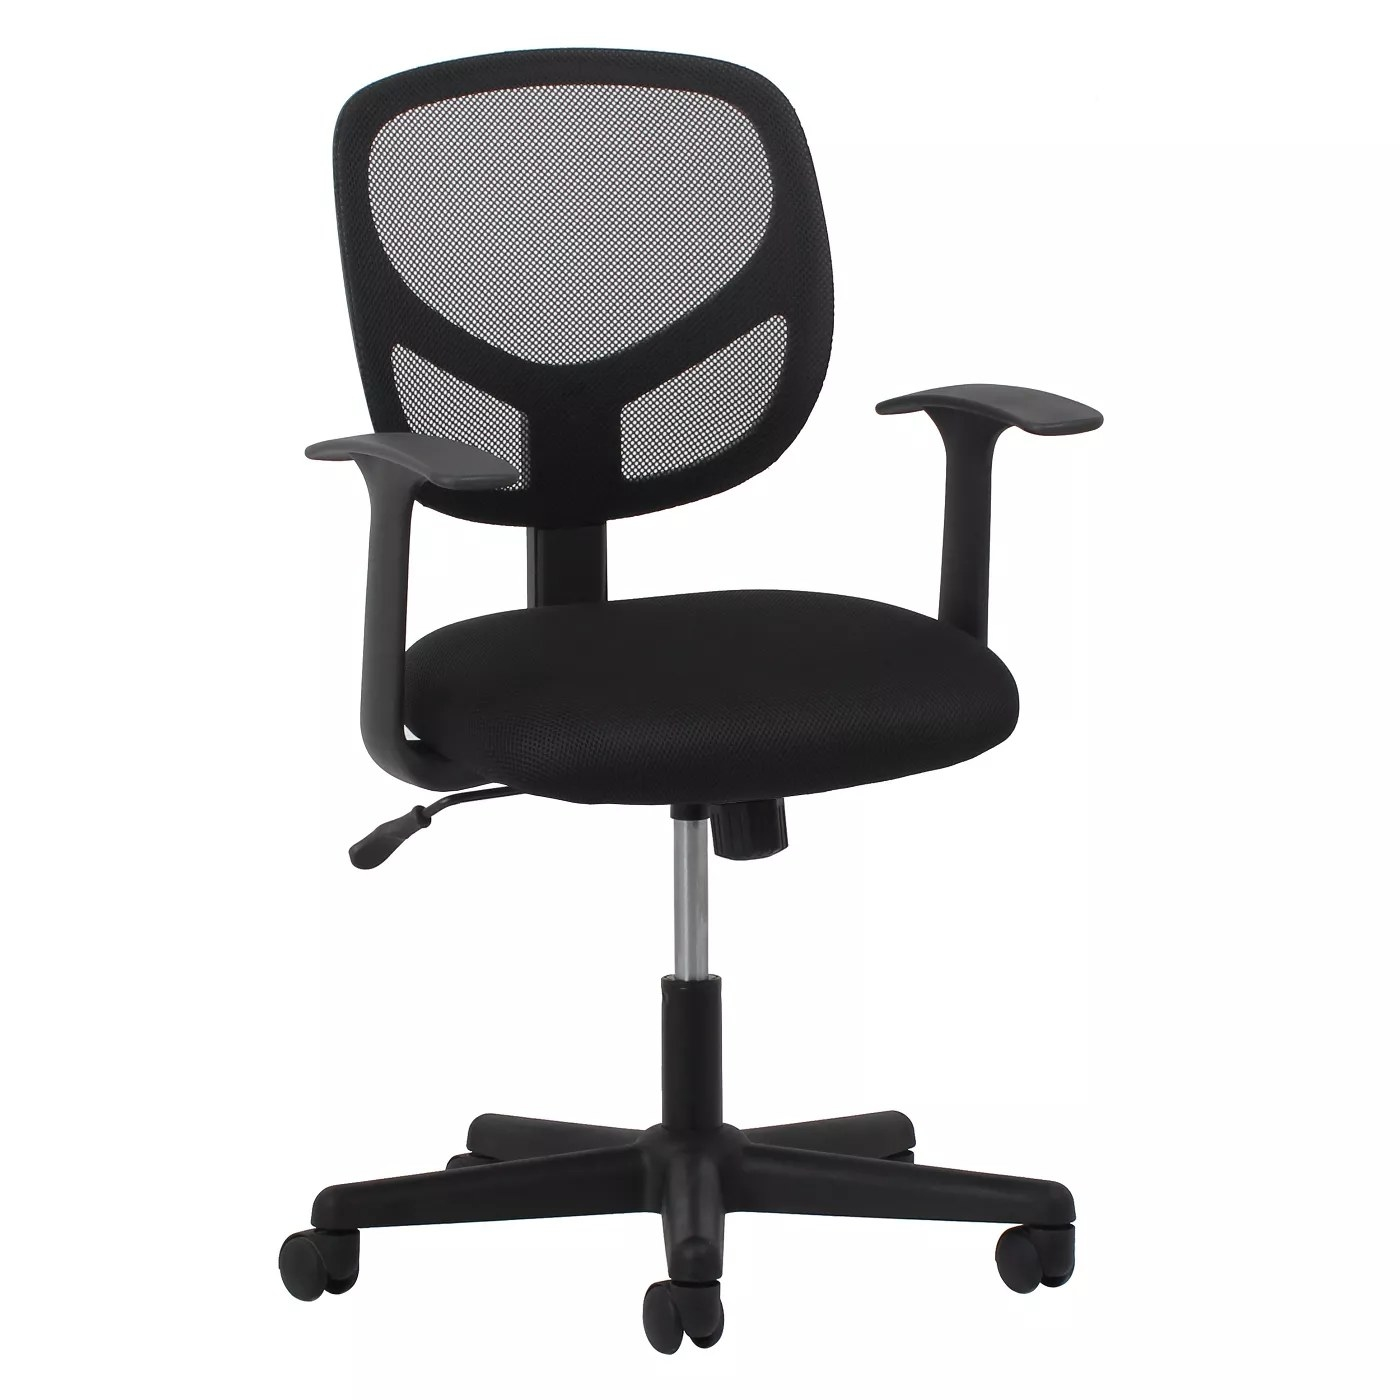 The swivel chair